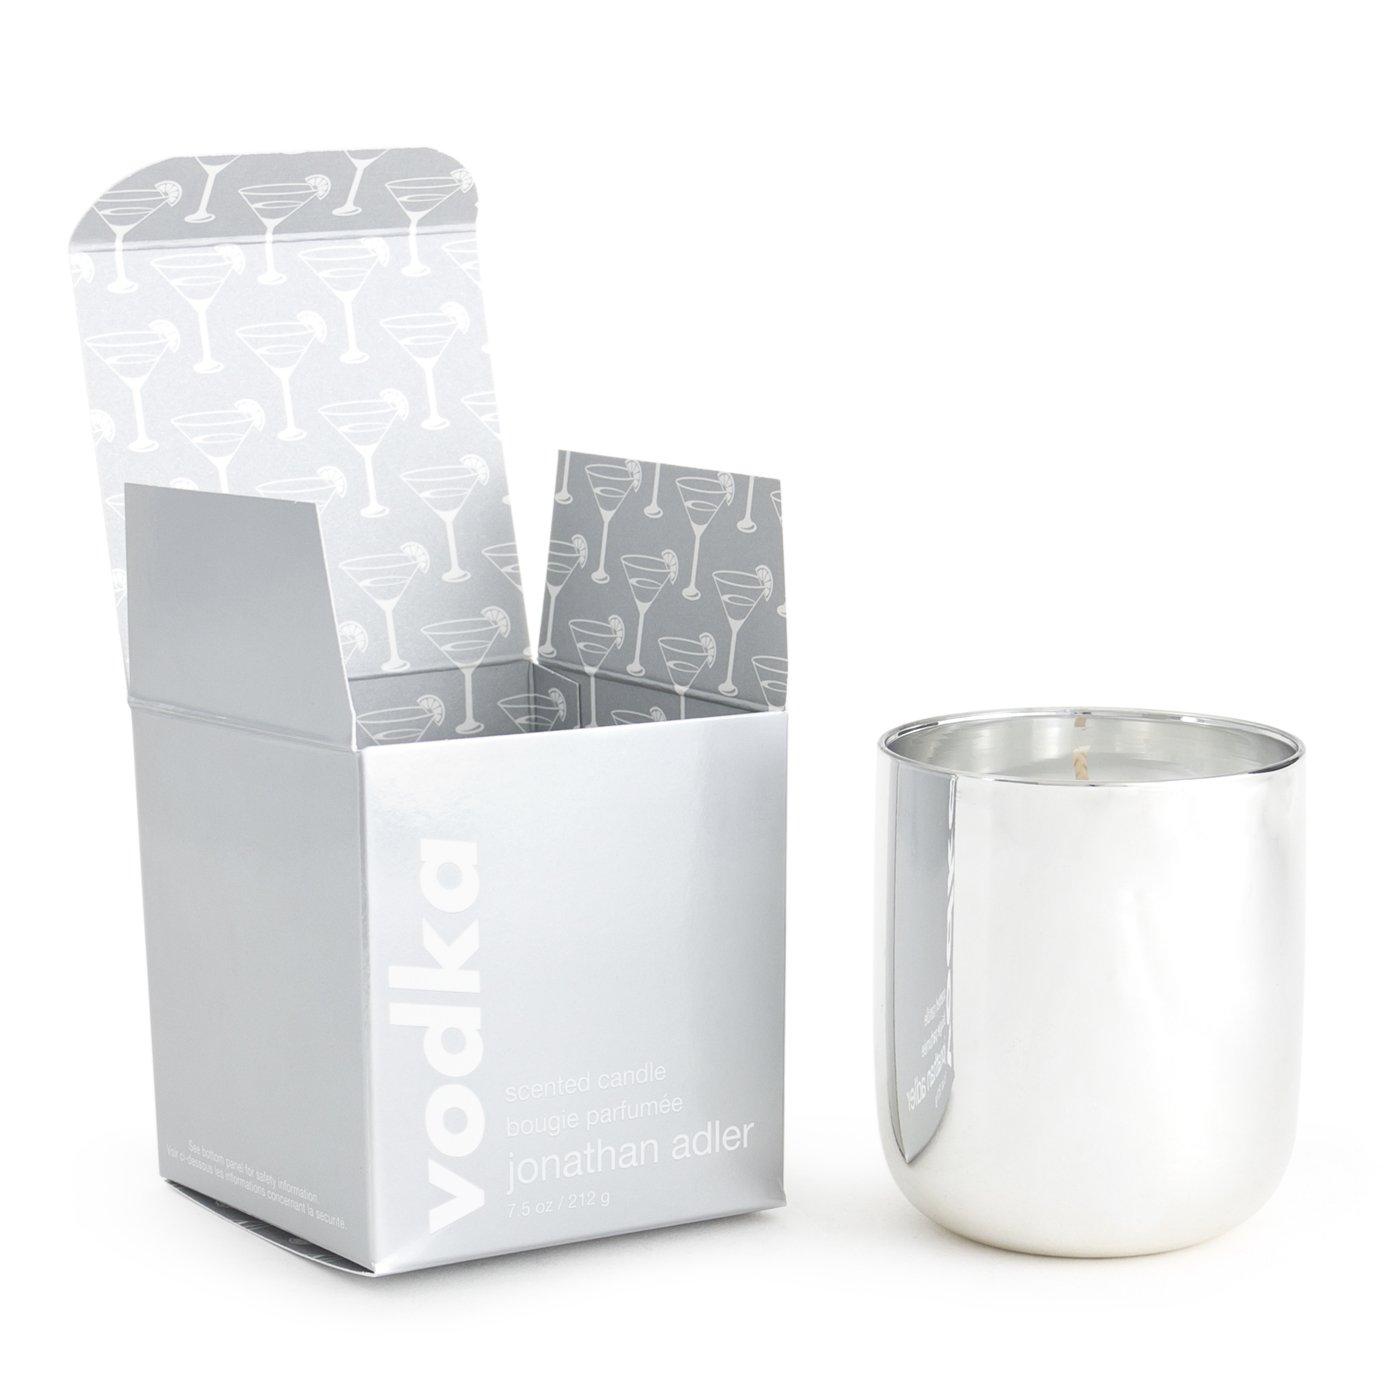 Jonathan Adler Pop Vodka Scented Candle, Silver